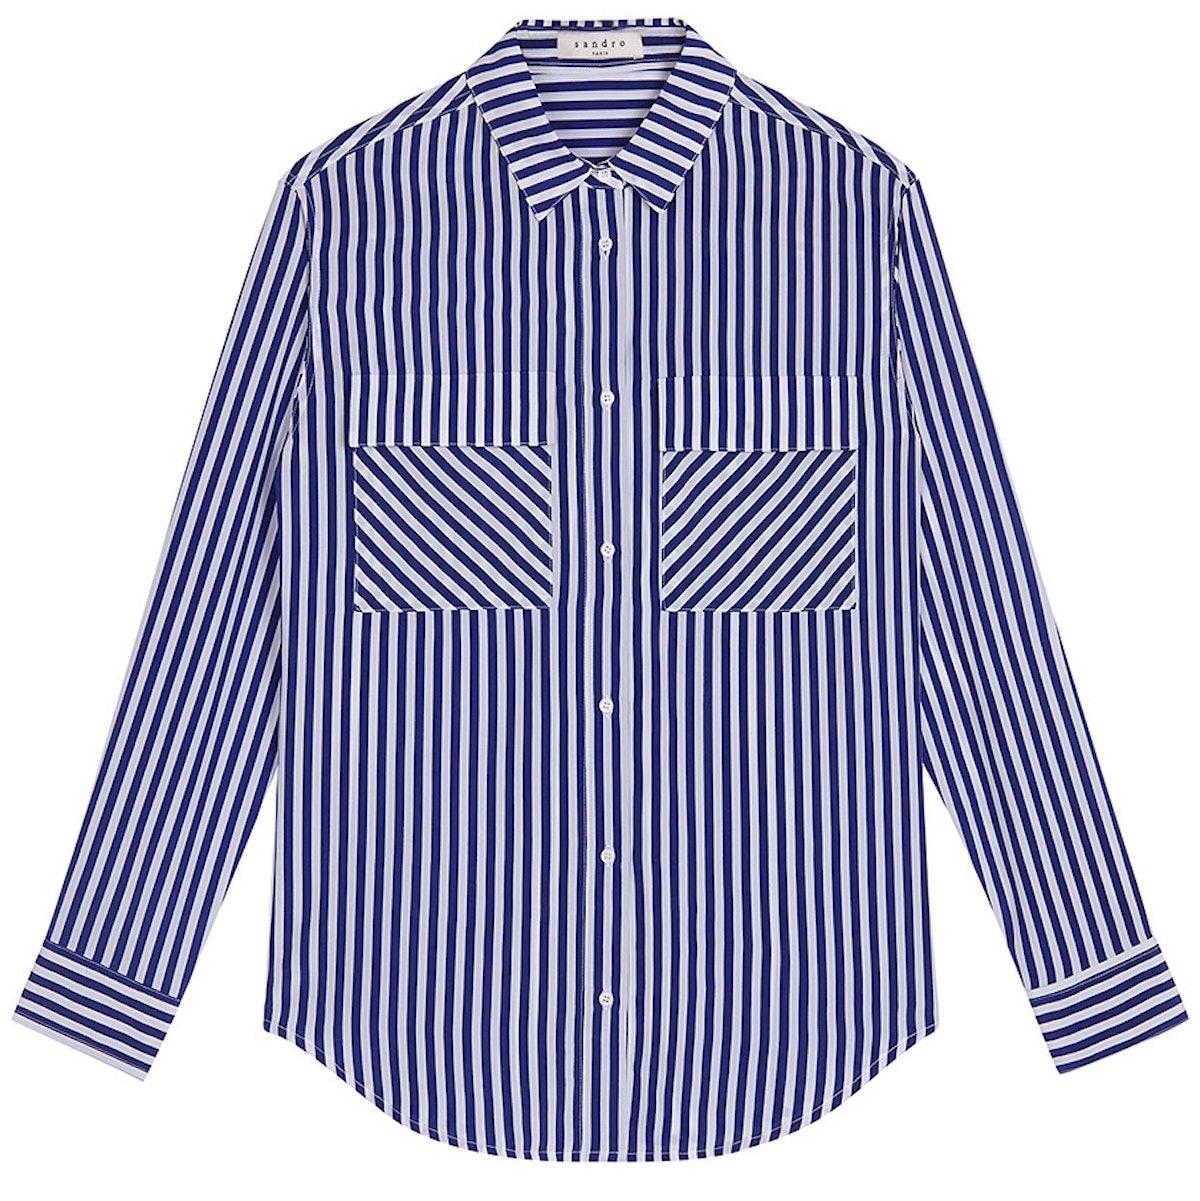 Seattle fans, show your stripes.       *Sandro shirt, $375, [sandro-paris.com](http://us.sandro-paris.com/).*